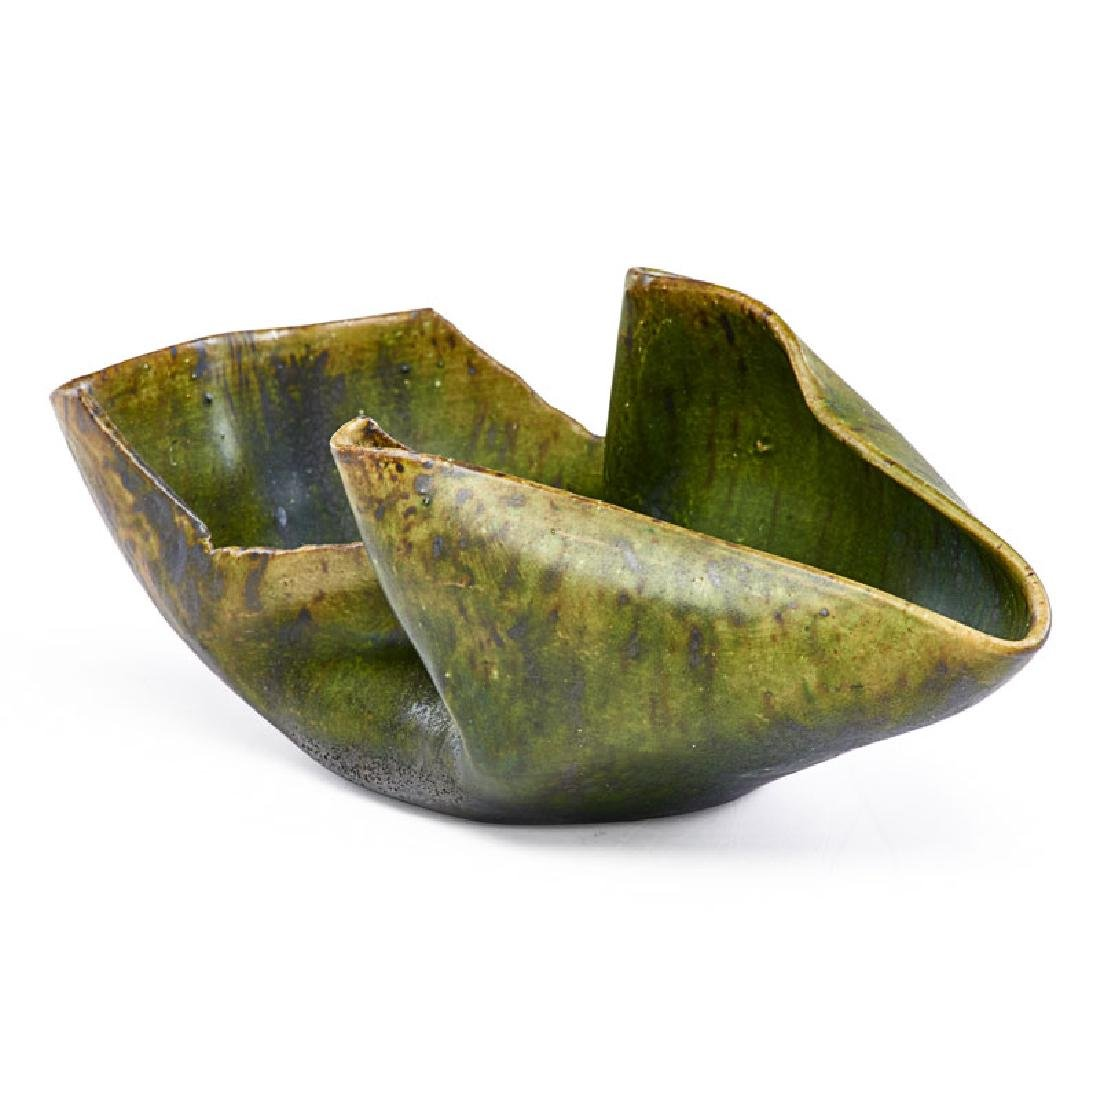 GEORGE OHR Low folded vessel